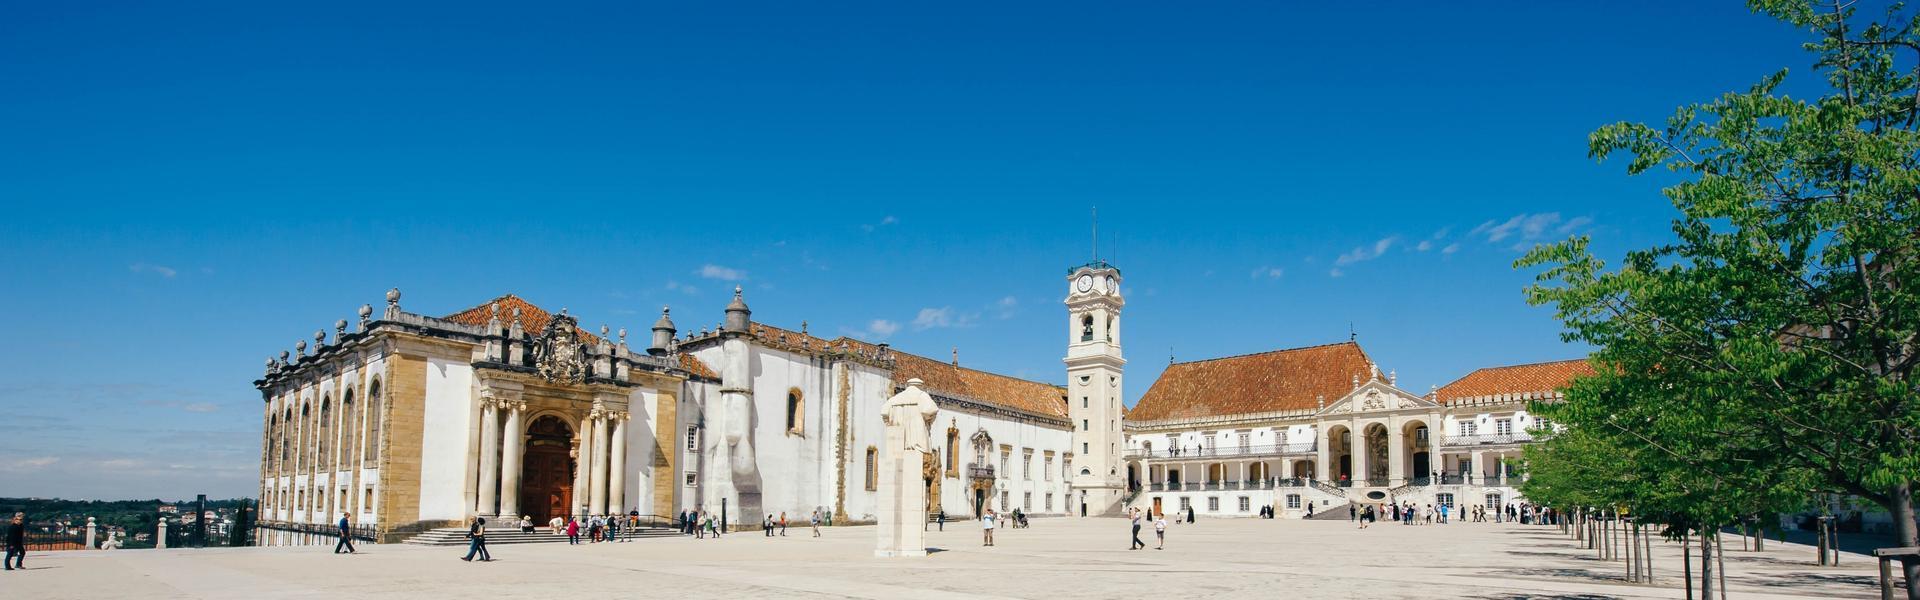 5 de maio: Dia Mundial da Língua Portuguesa